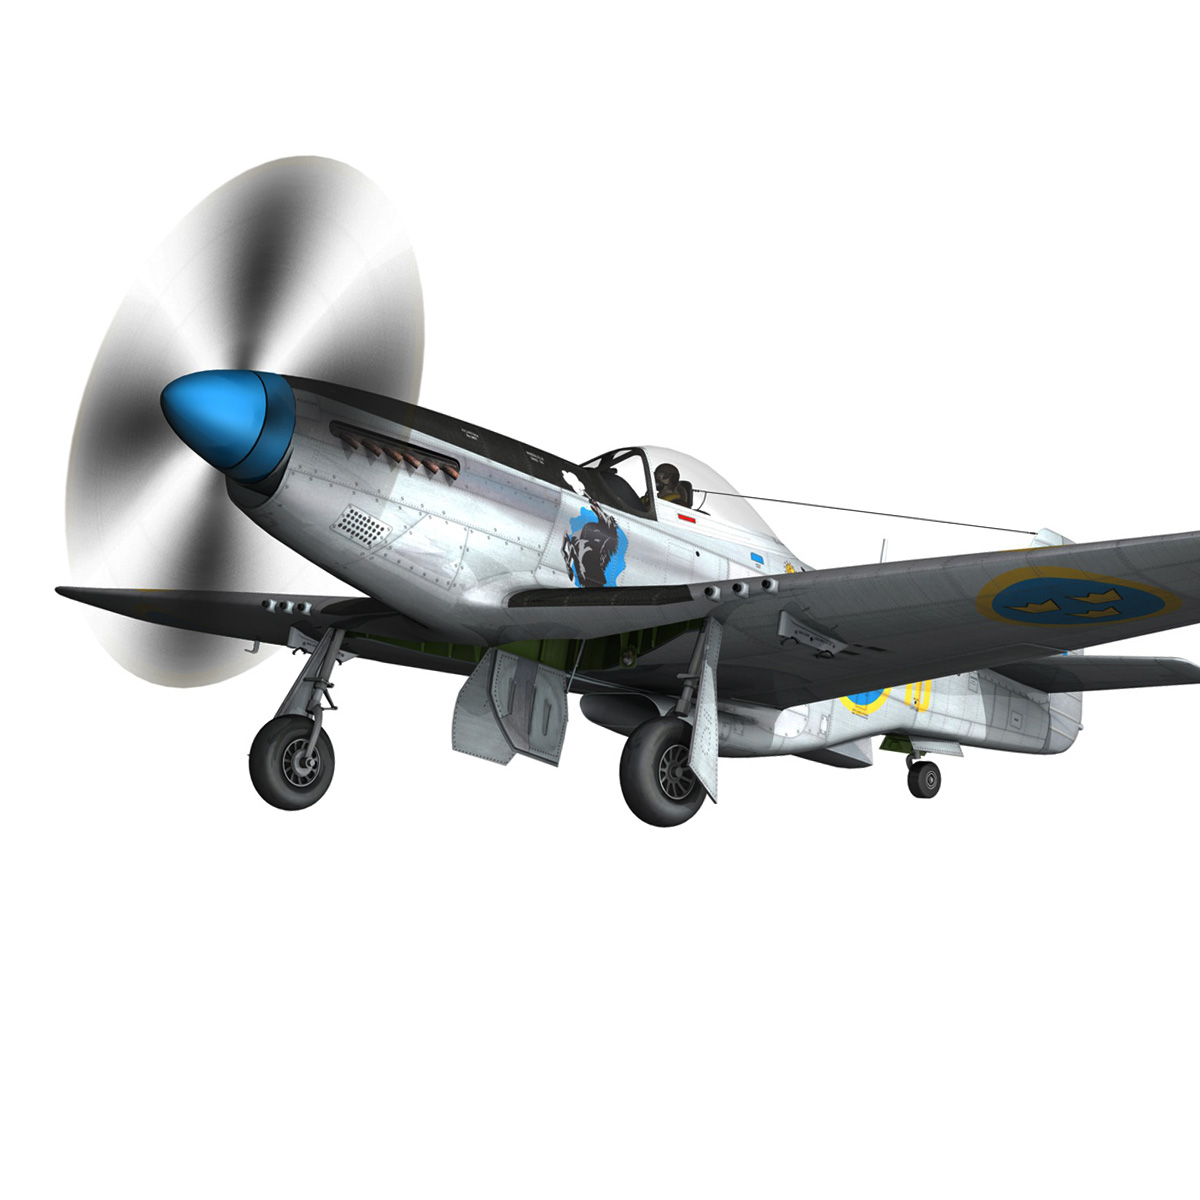 north american p-51d mustang – swedisch airforce 3d model fbx c4d lwo obj 268234